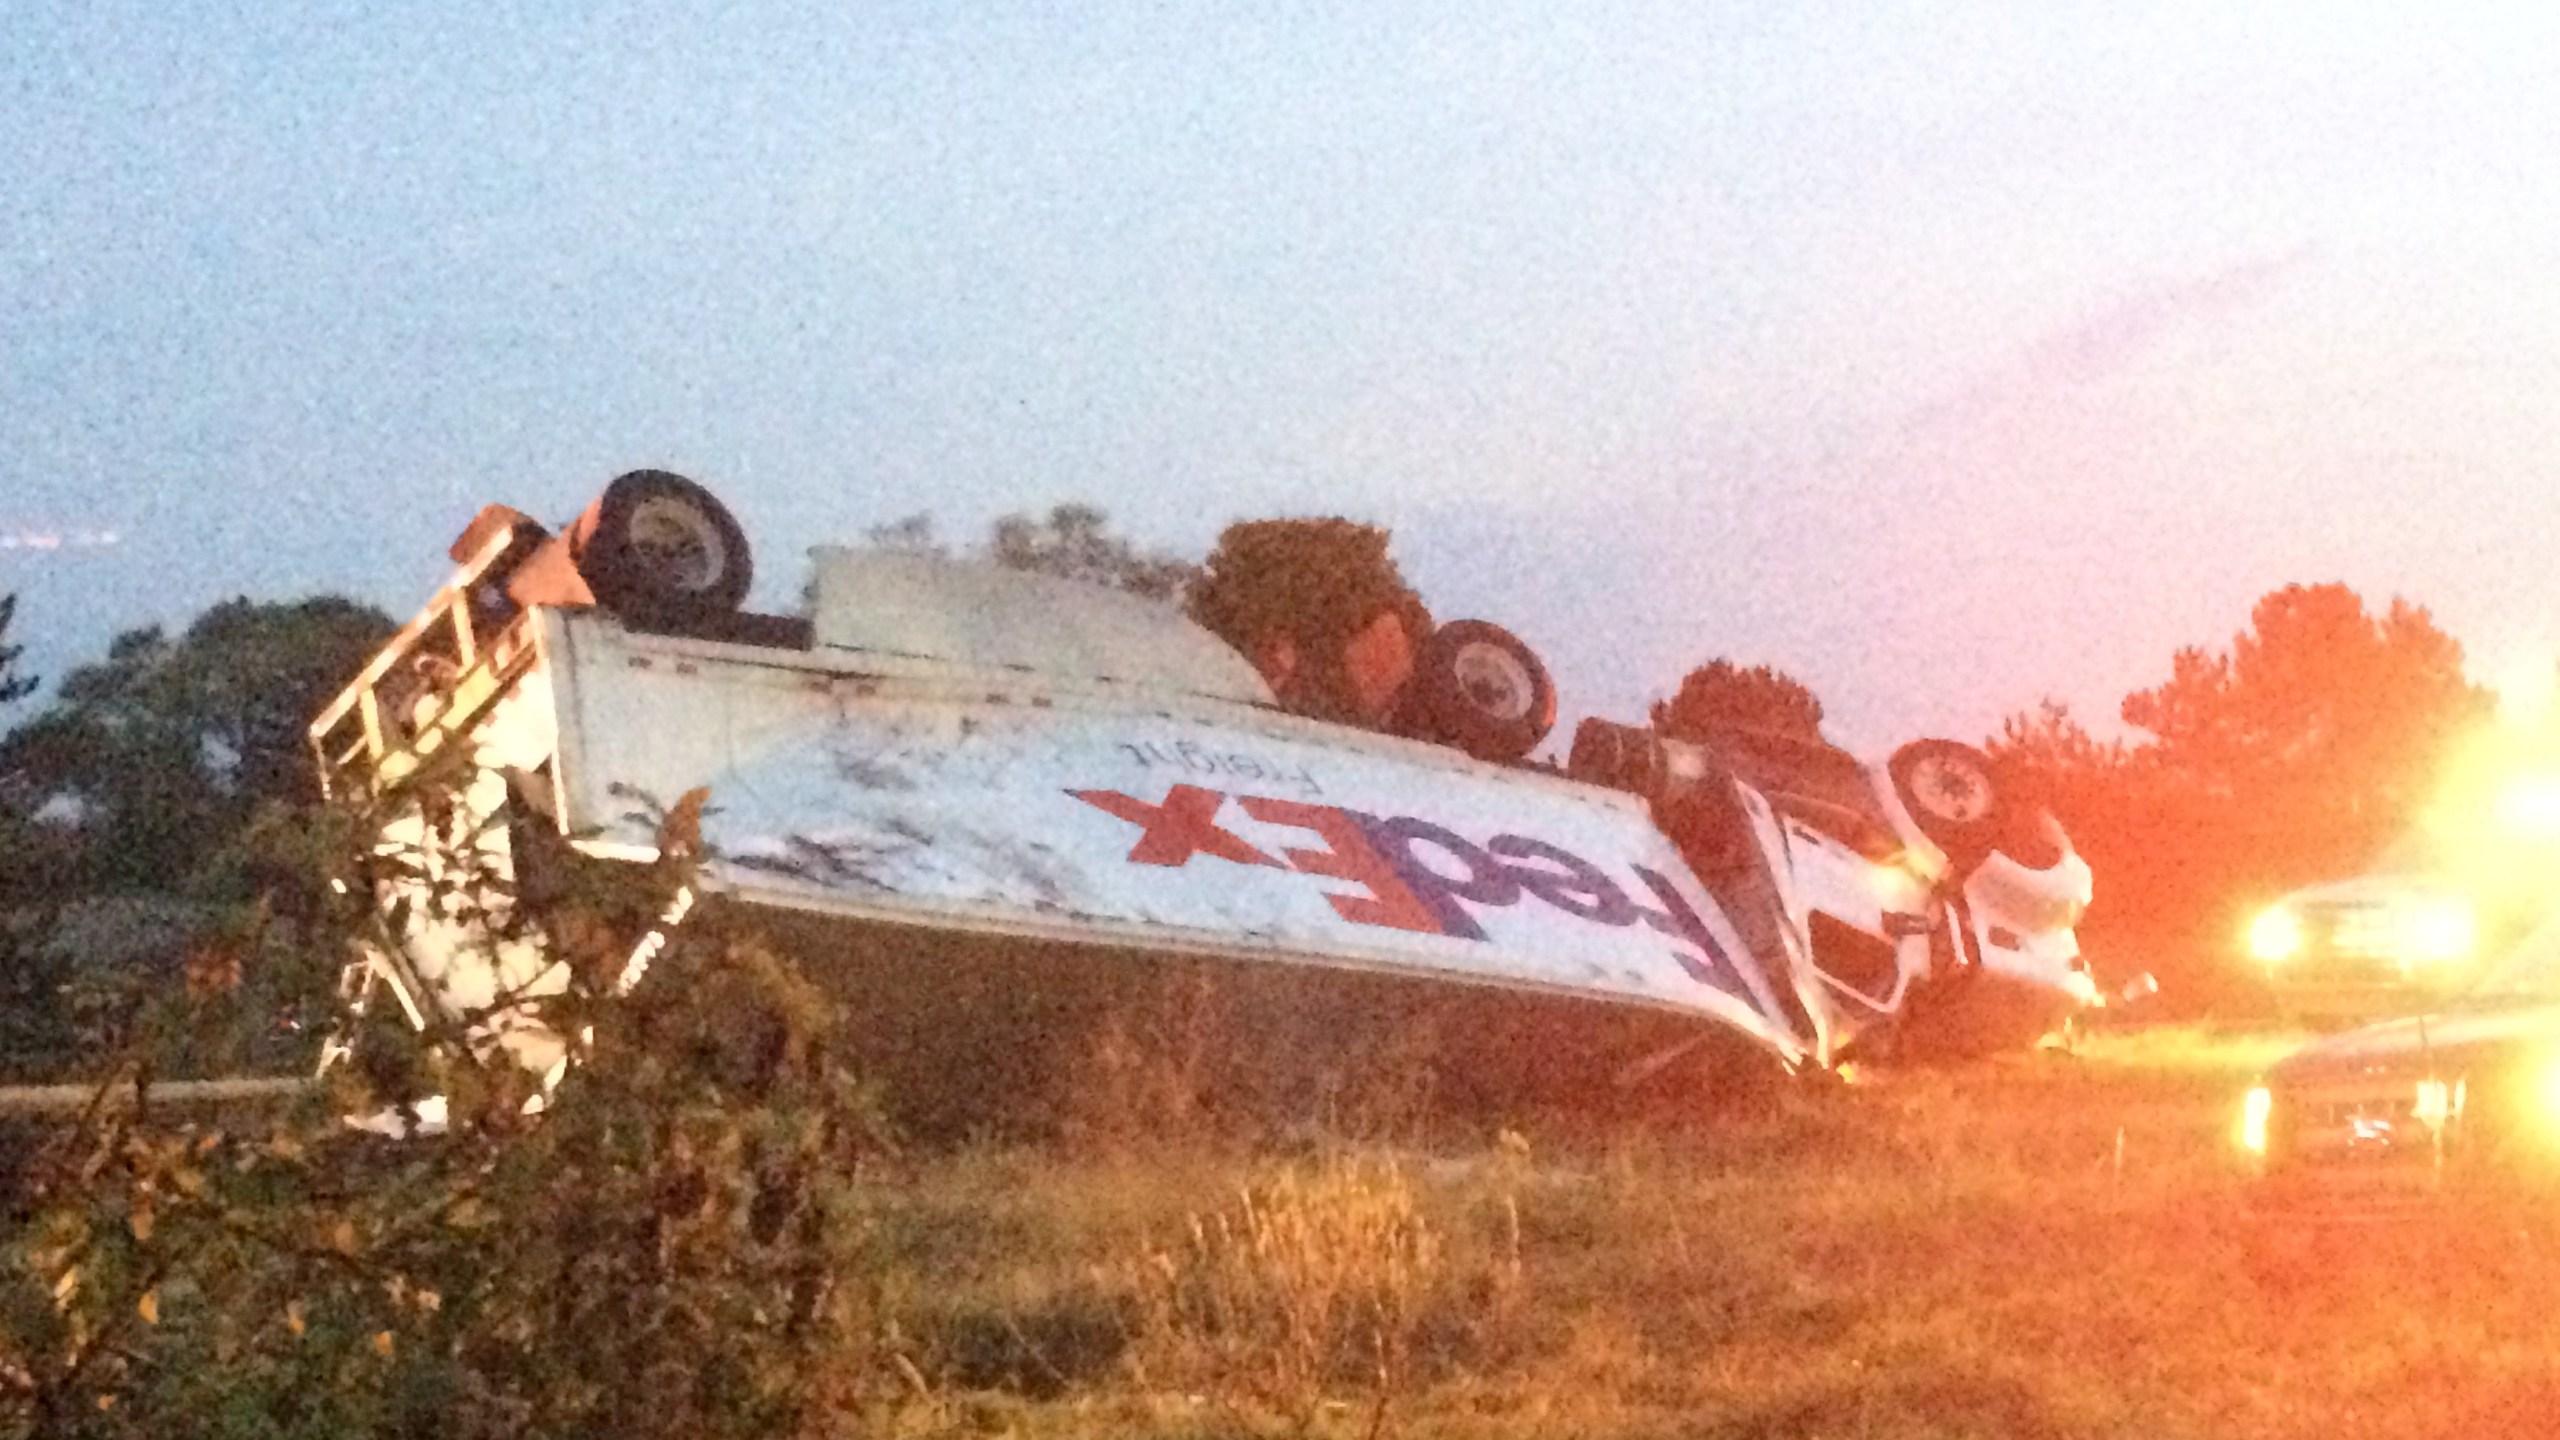 Semi-truck crash slows traffic on I-94 in Jackson Co